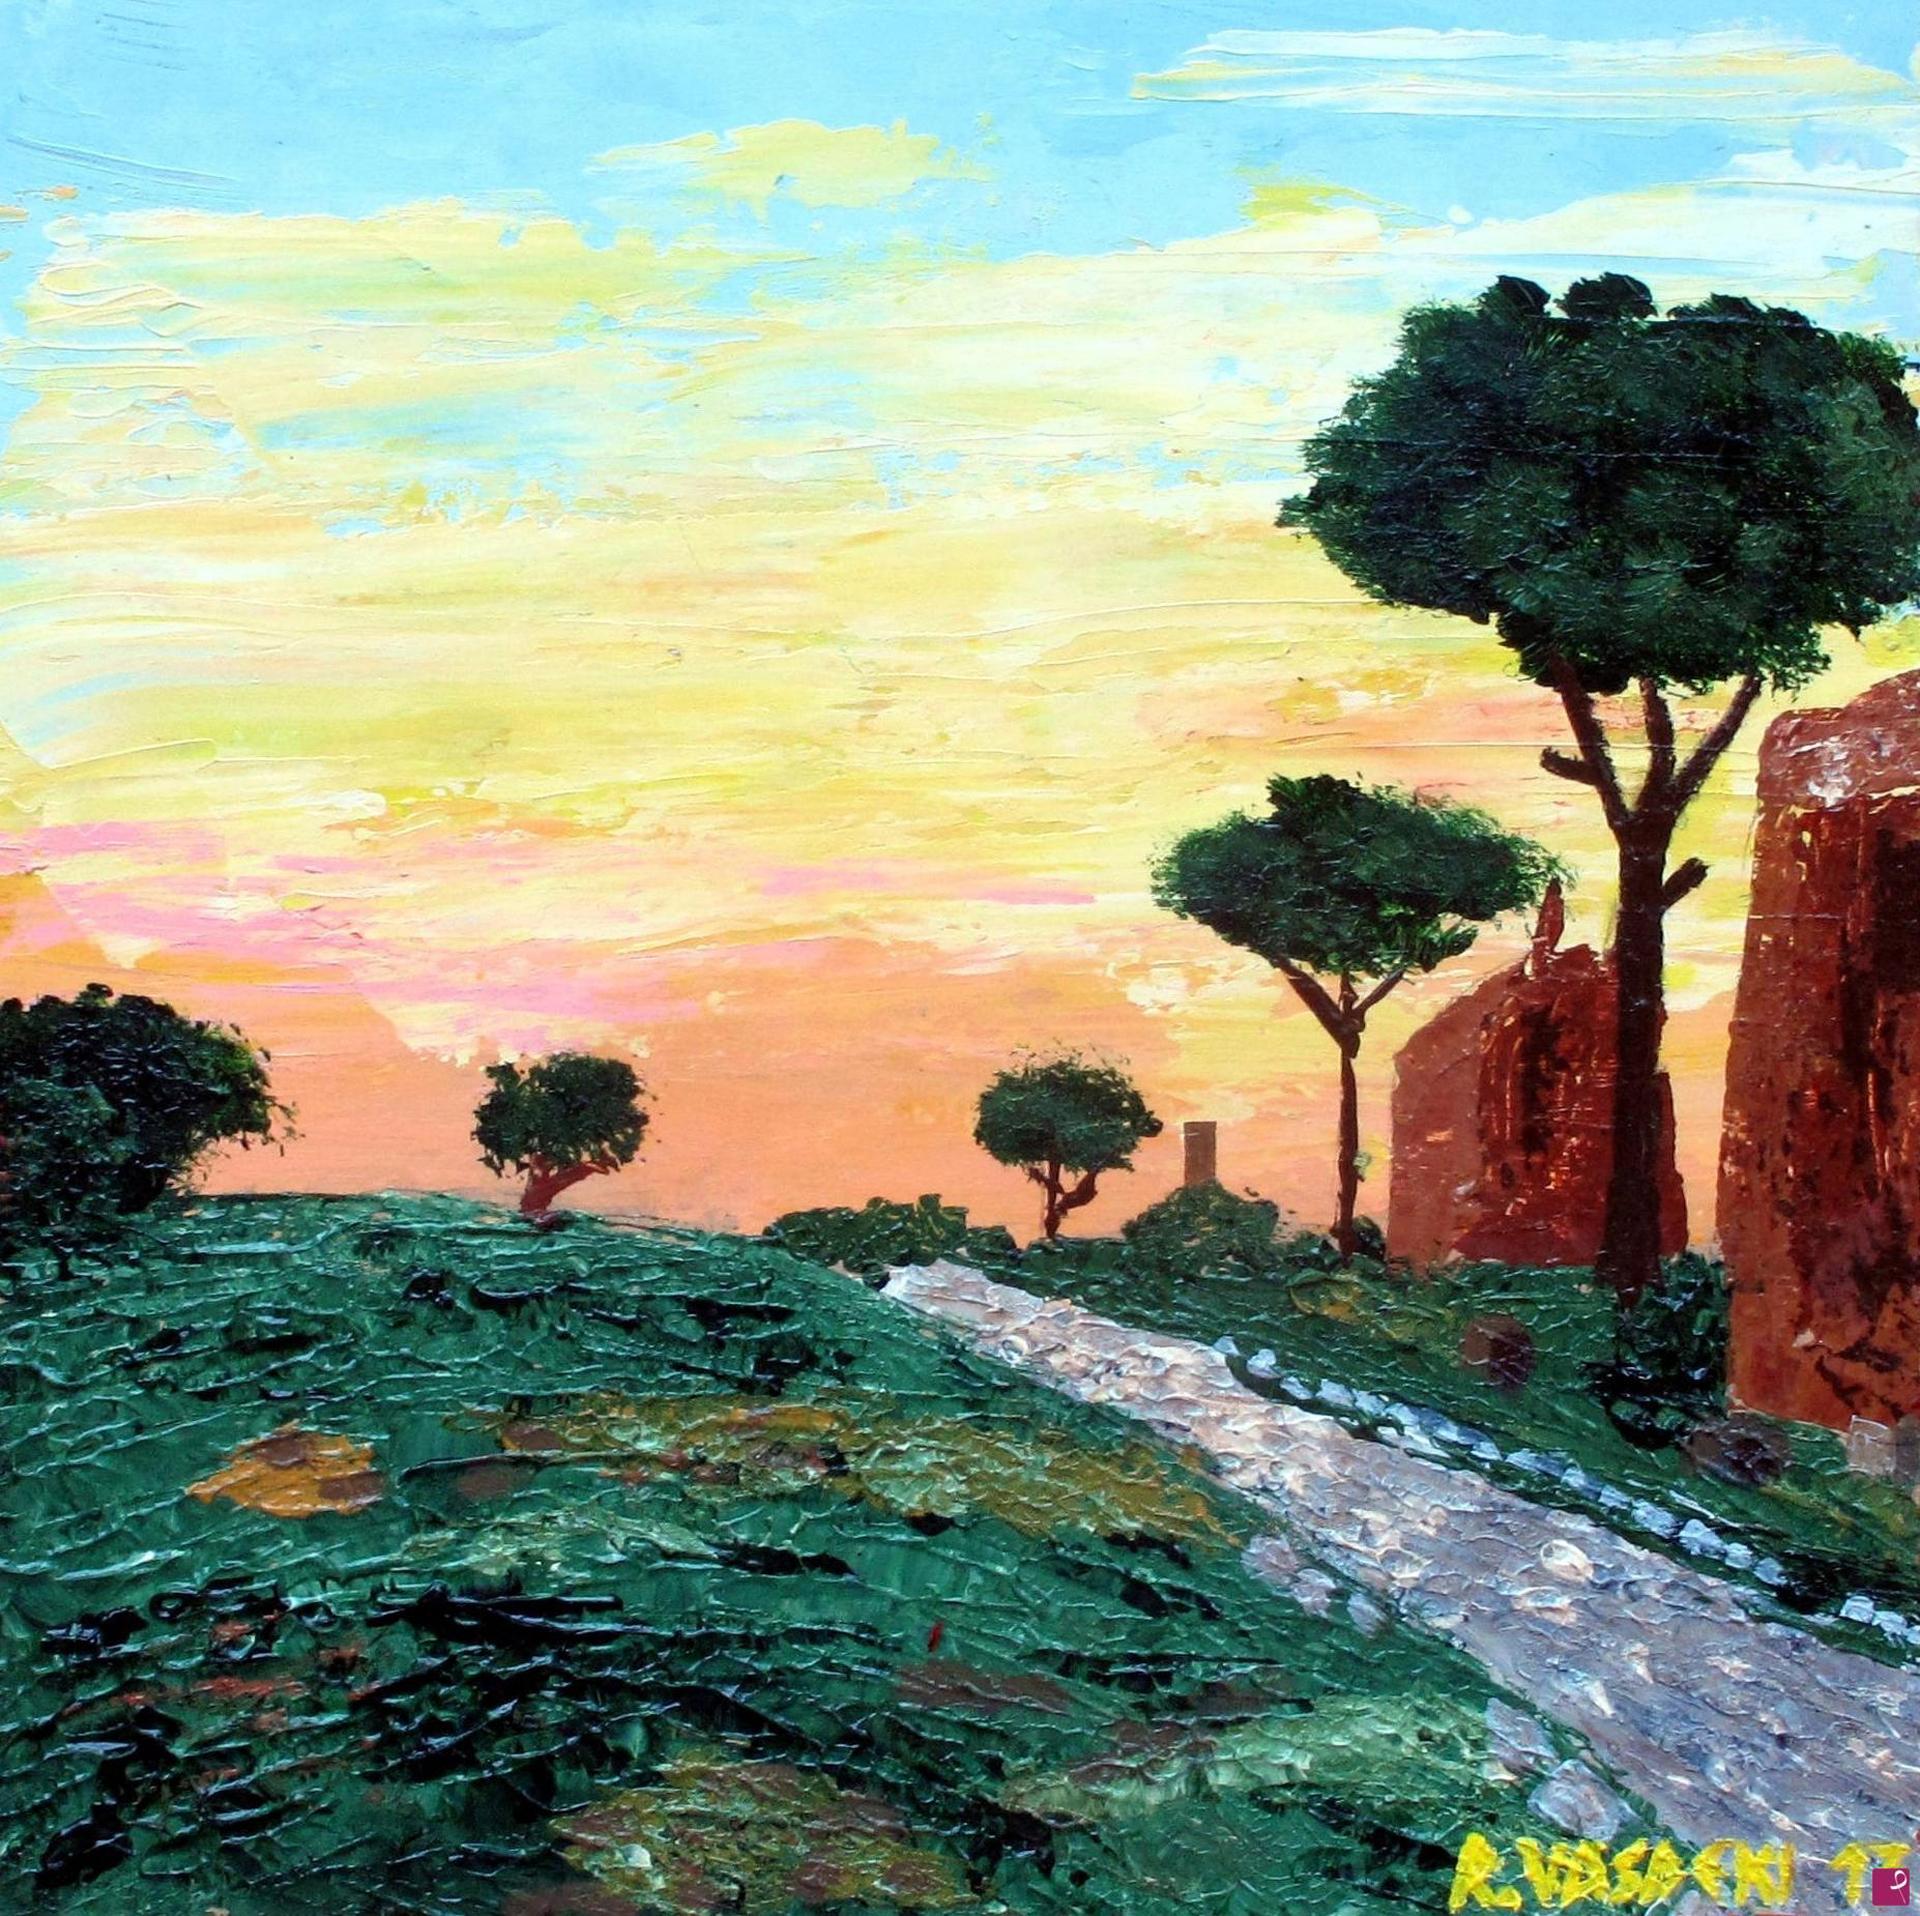 Riccardo Vasdeki - Via Appia a Roma - Acrilico a spatola su legno - 36x36cm